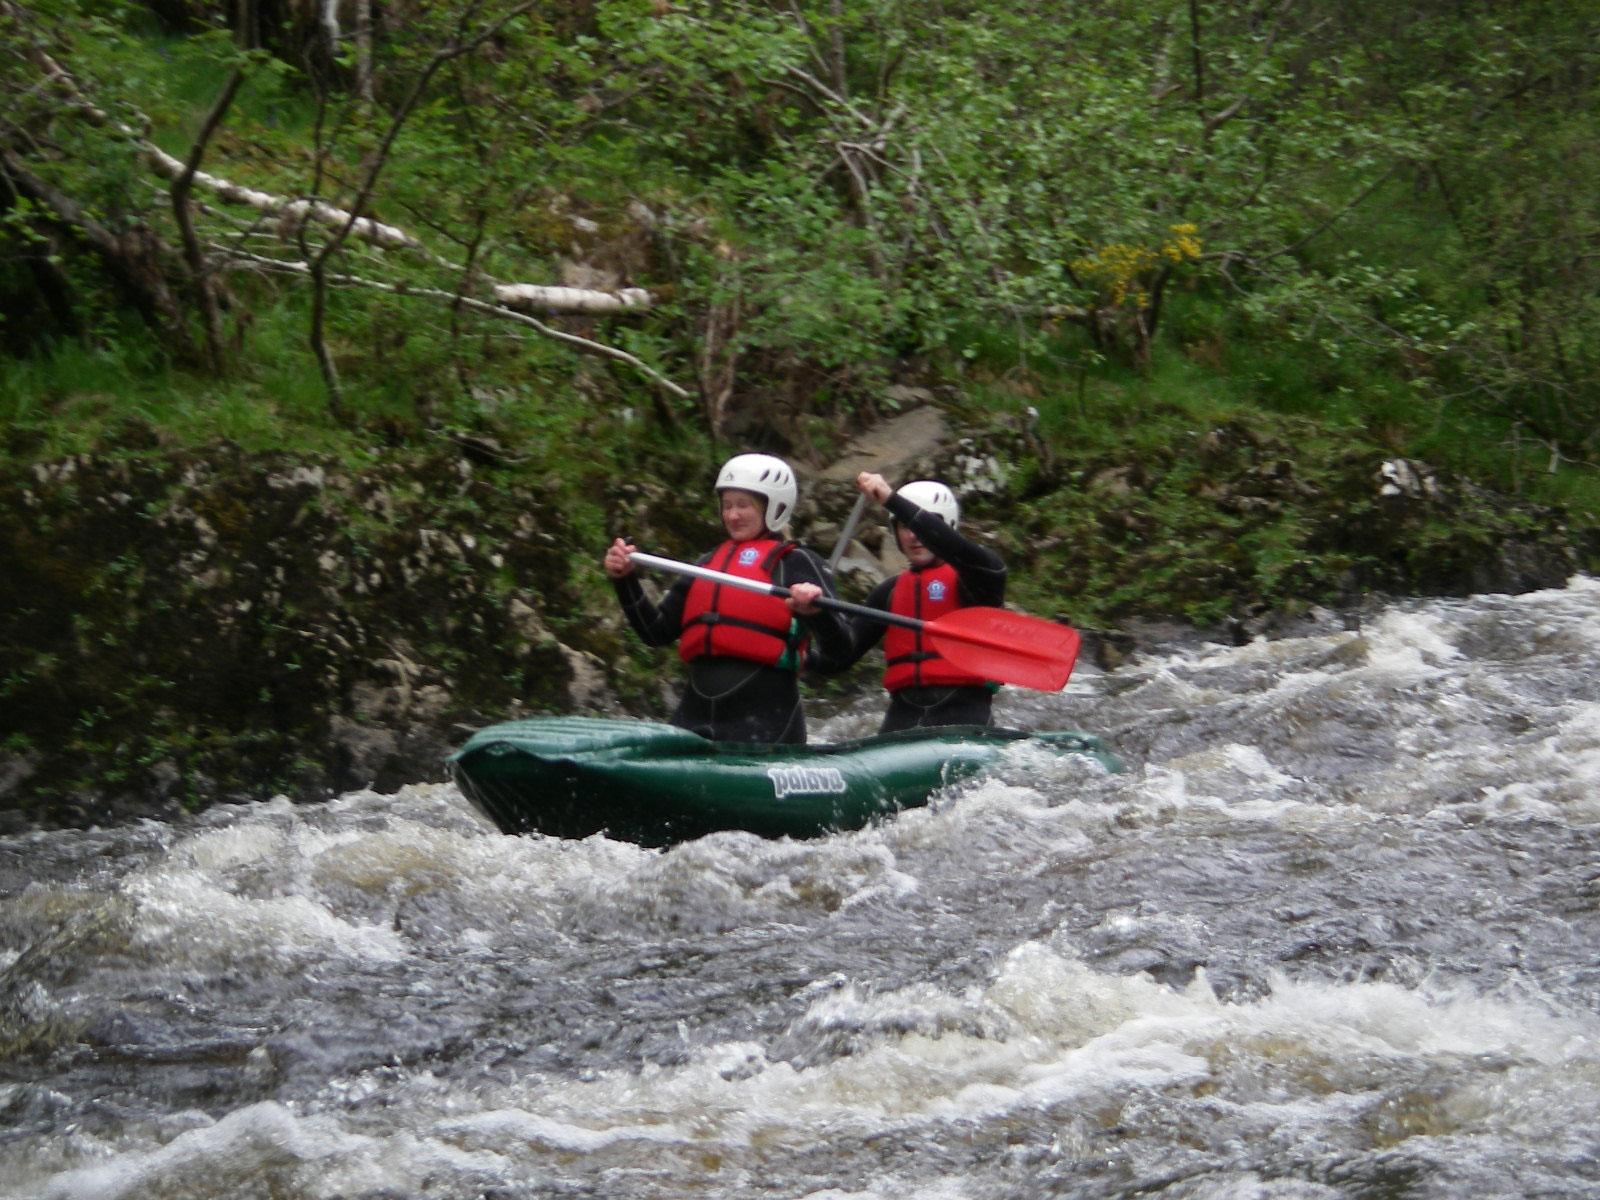 River Route 7: The Pleasant River